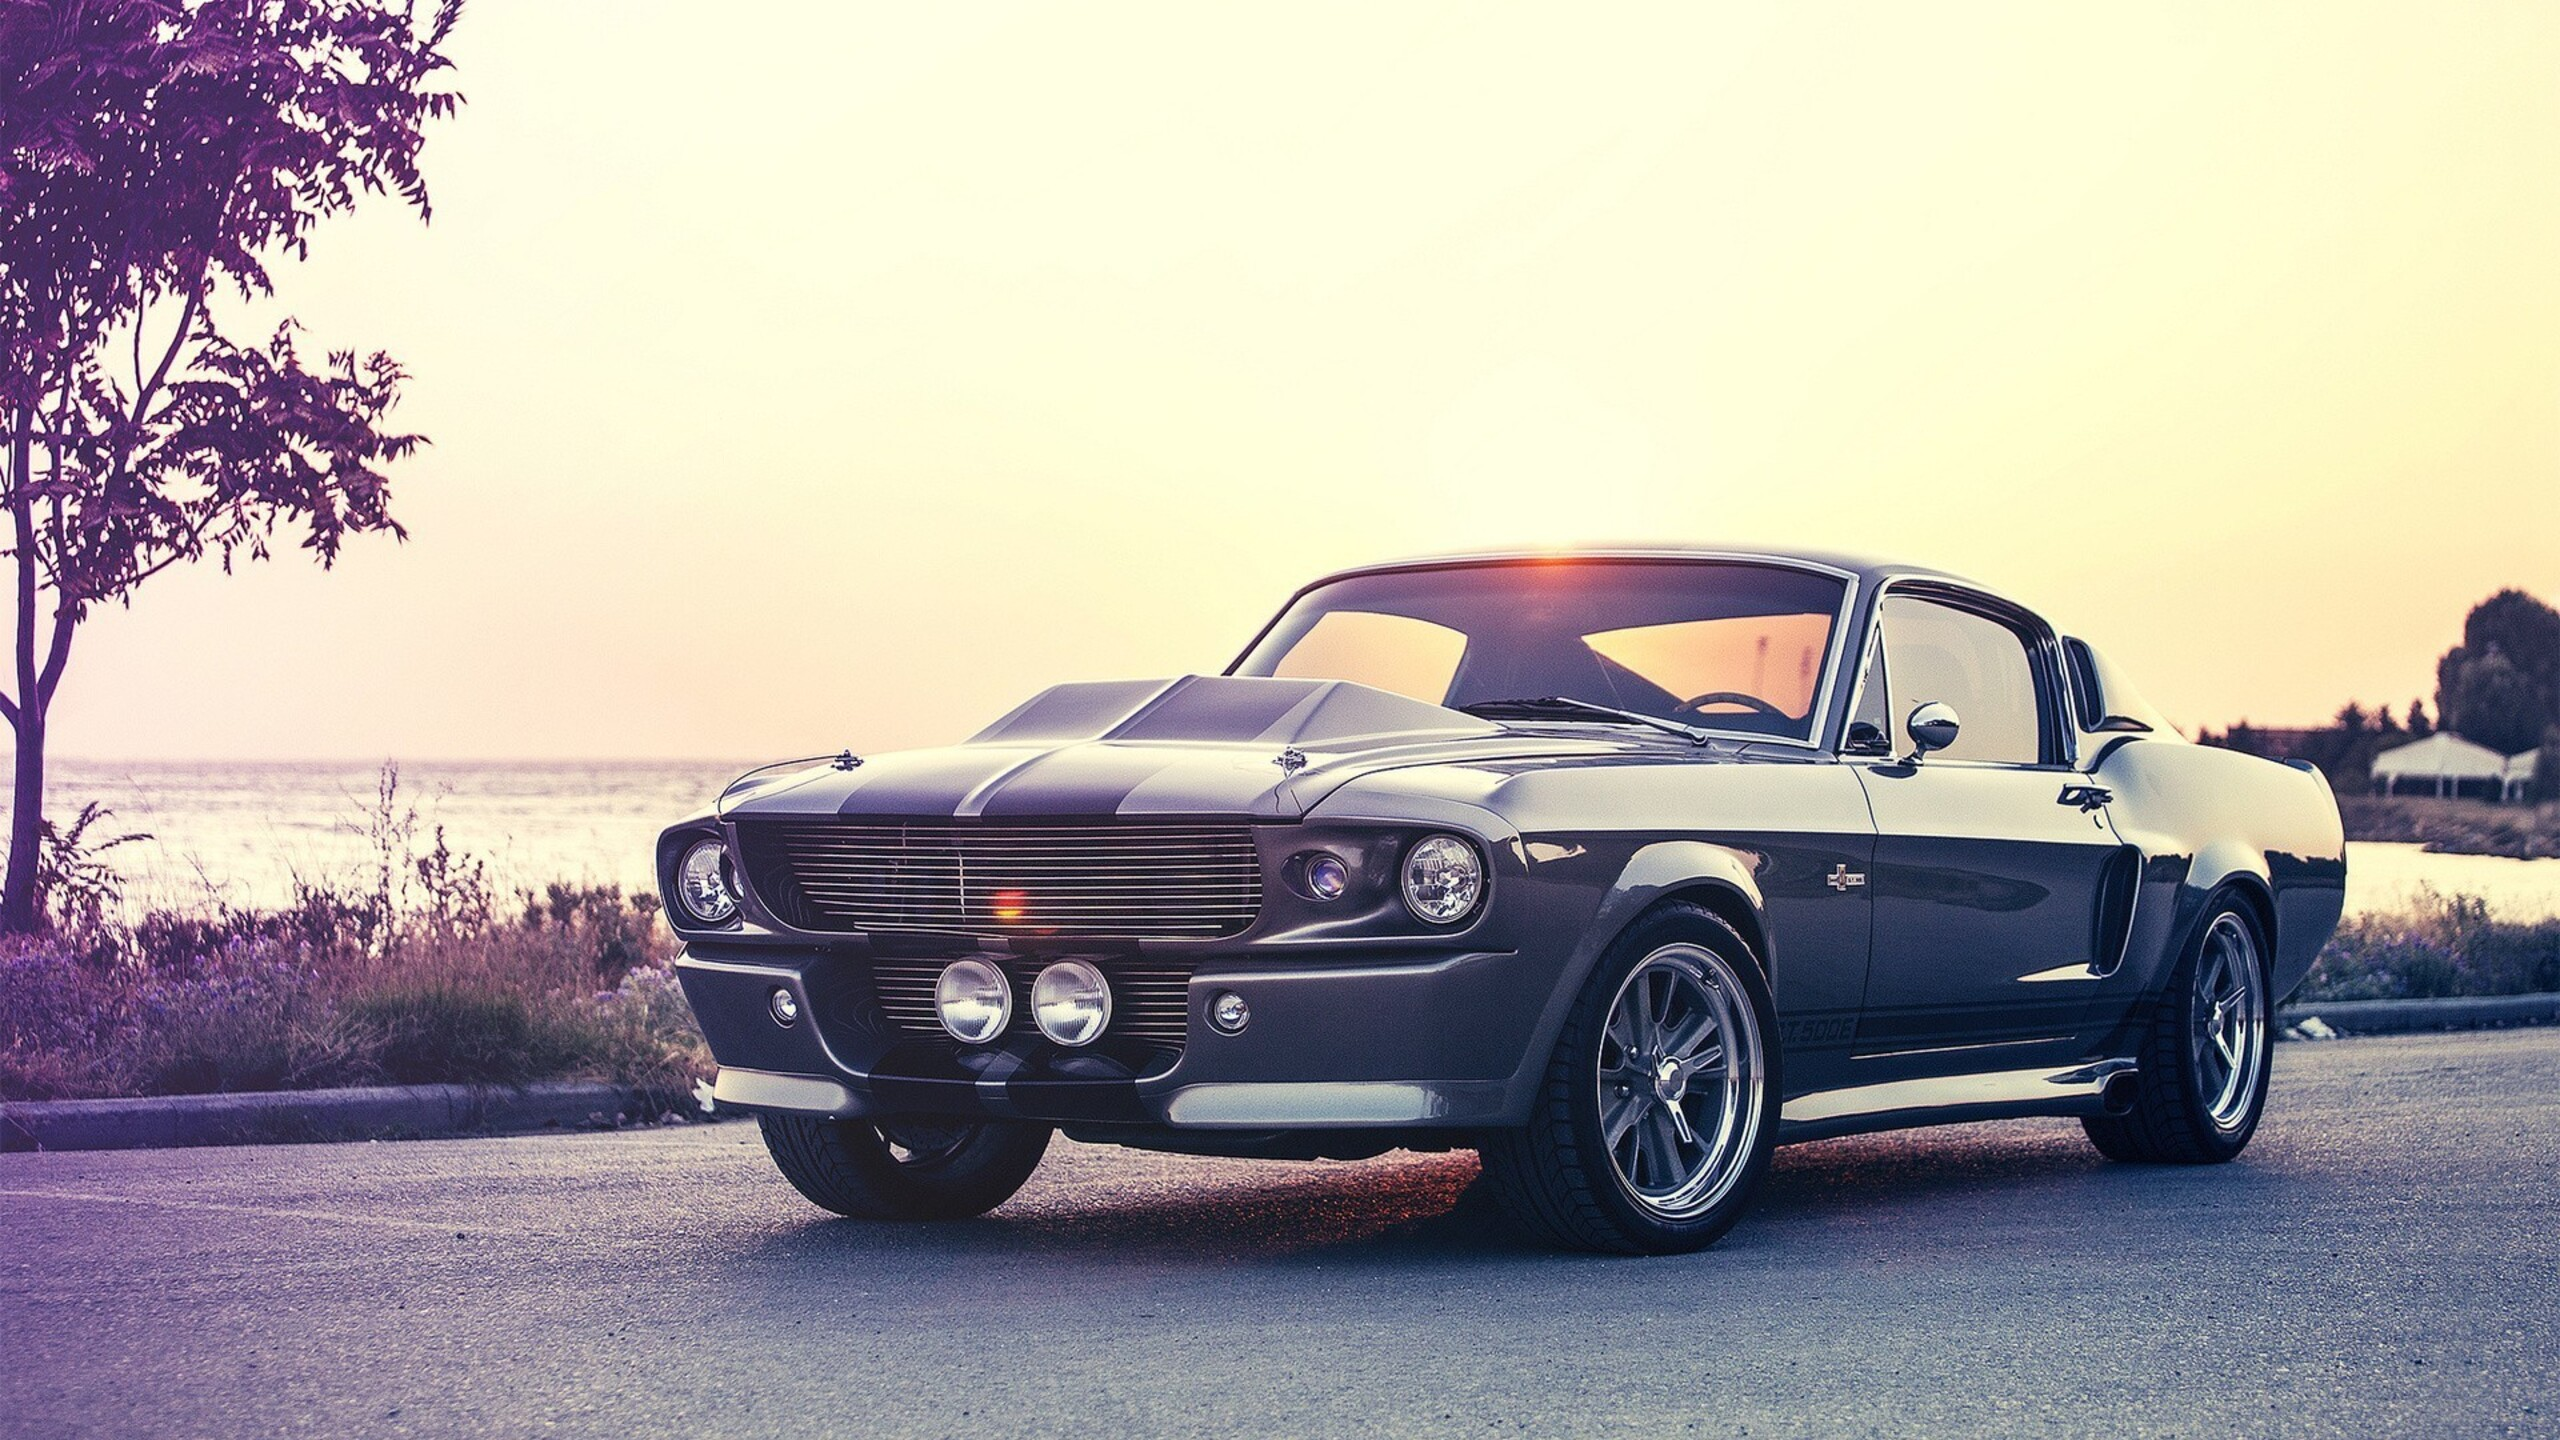 Shelby Mustang  № 2606757 бесплатно